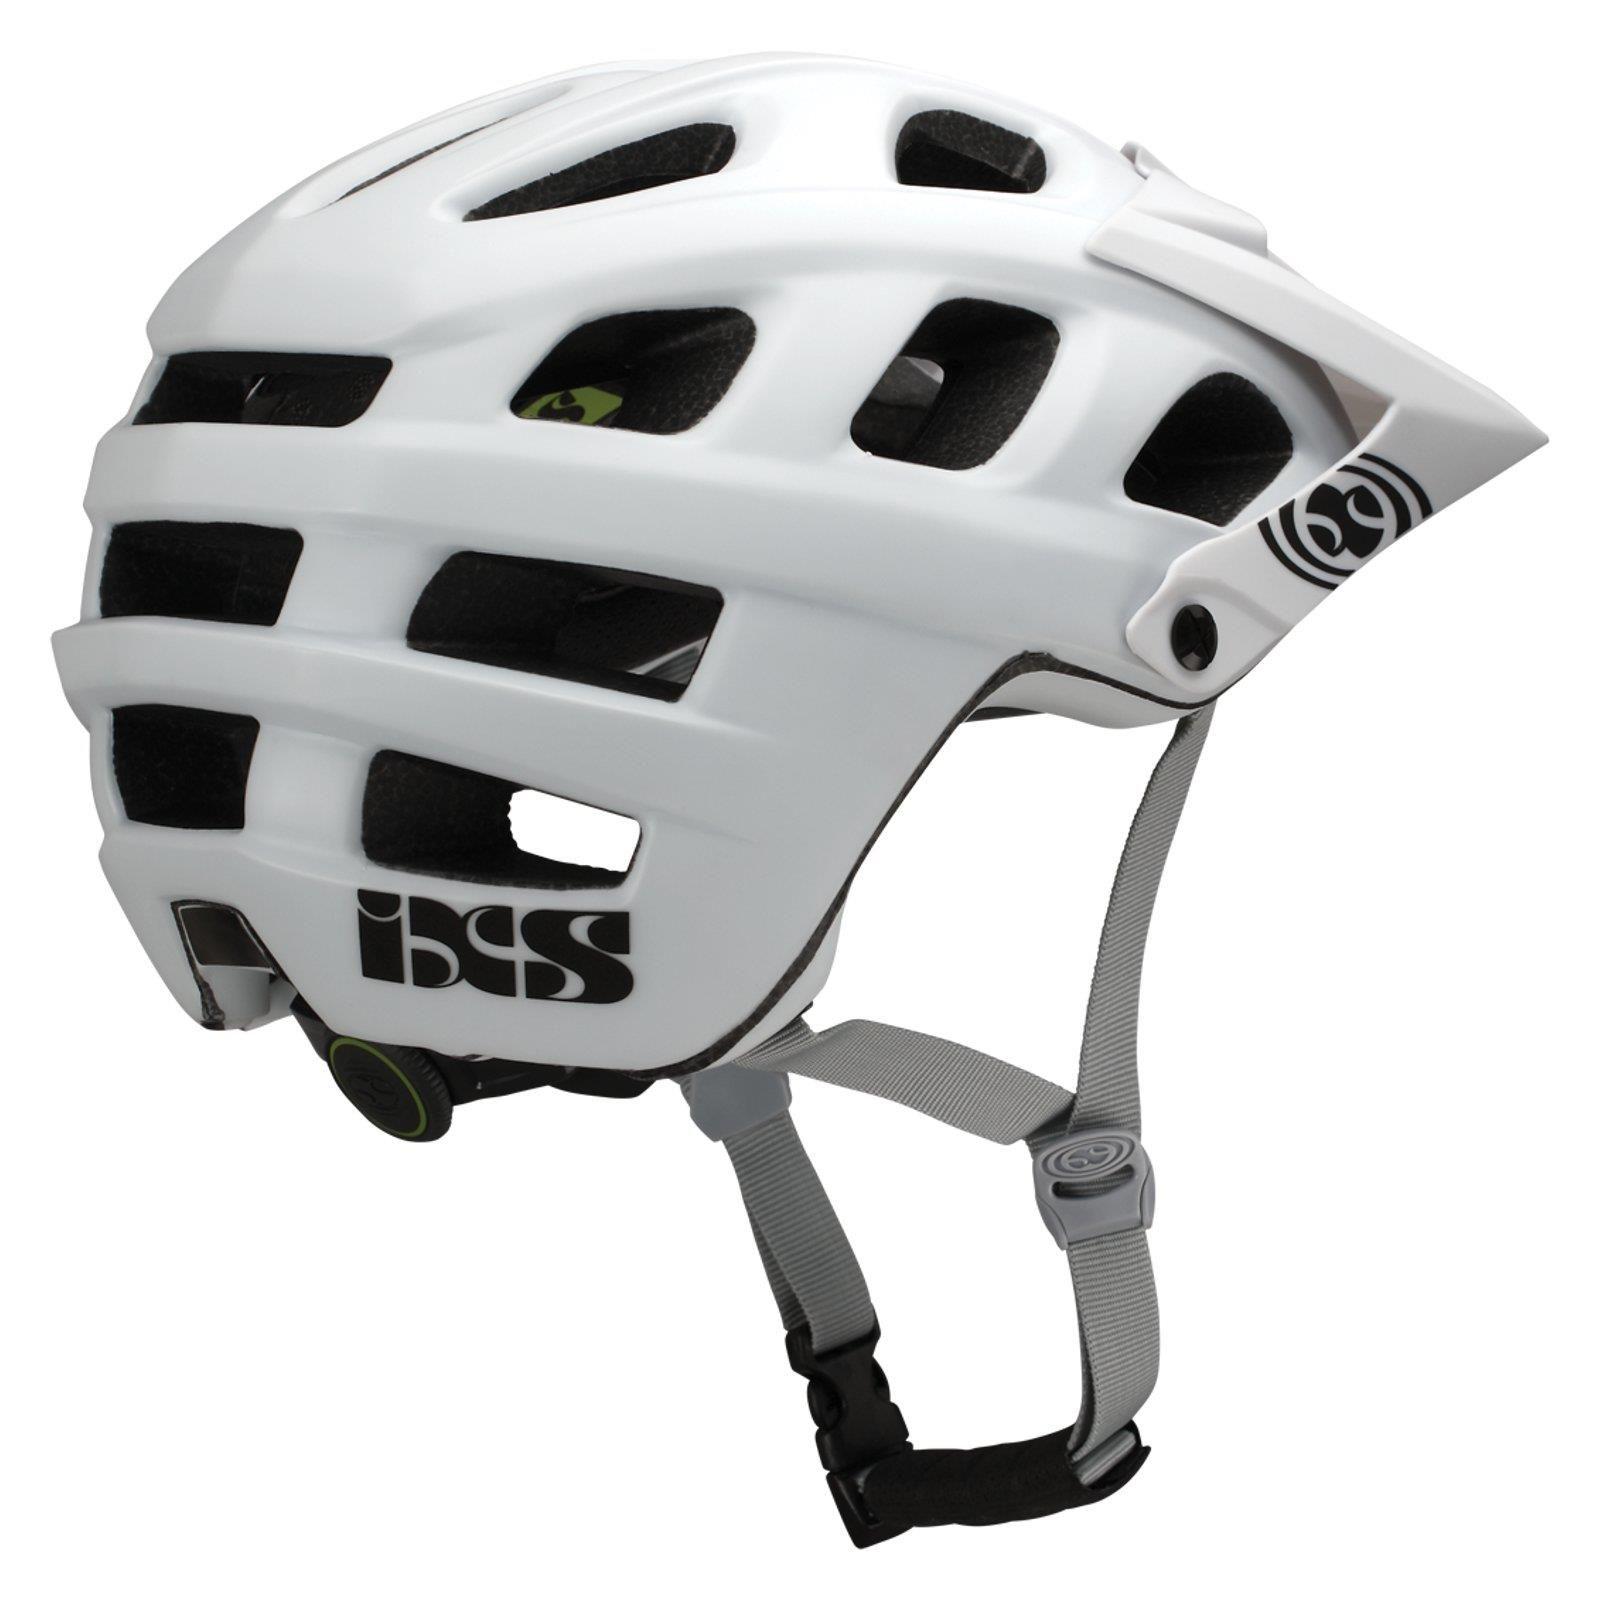 Ixs Trail Rs Evo Fahrrad Helm All Mountain Bike Am Mtb Enduro Dh Downhill Inmold Ad Sponsored Evo Fahrrad He All Mountain Bike Enduro Mtb Mountain Biking